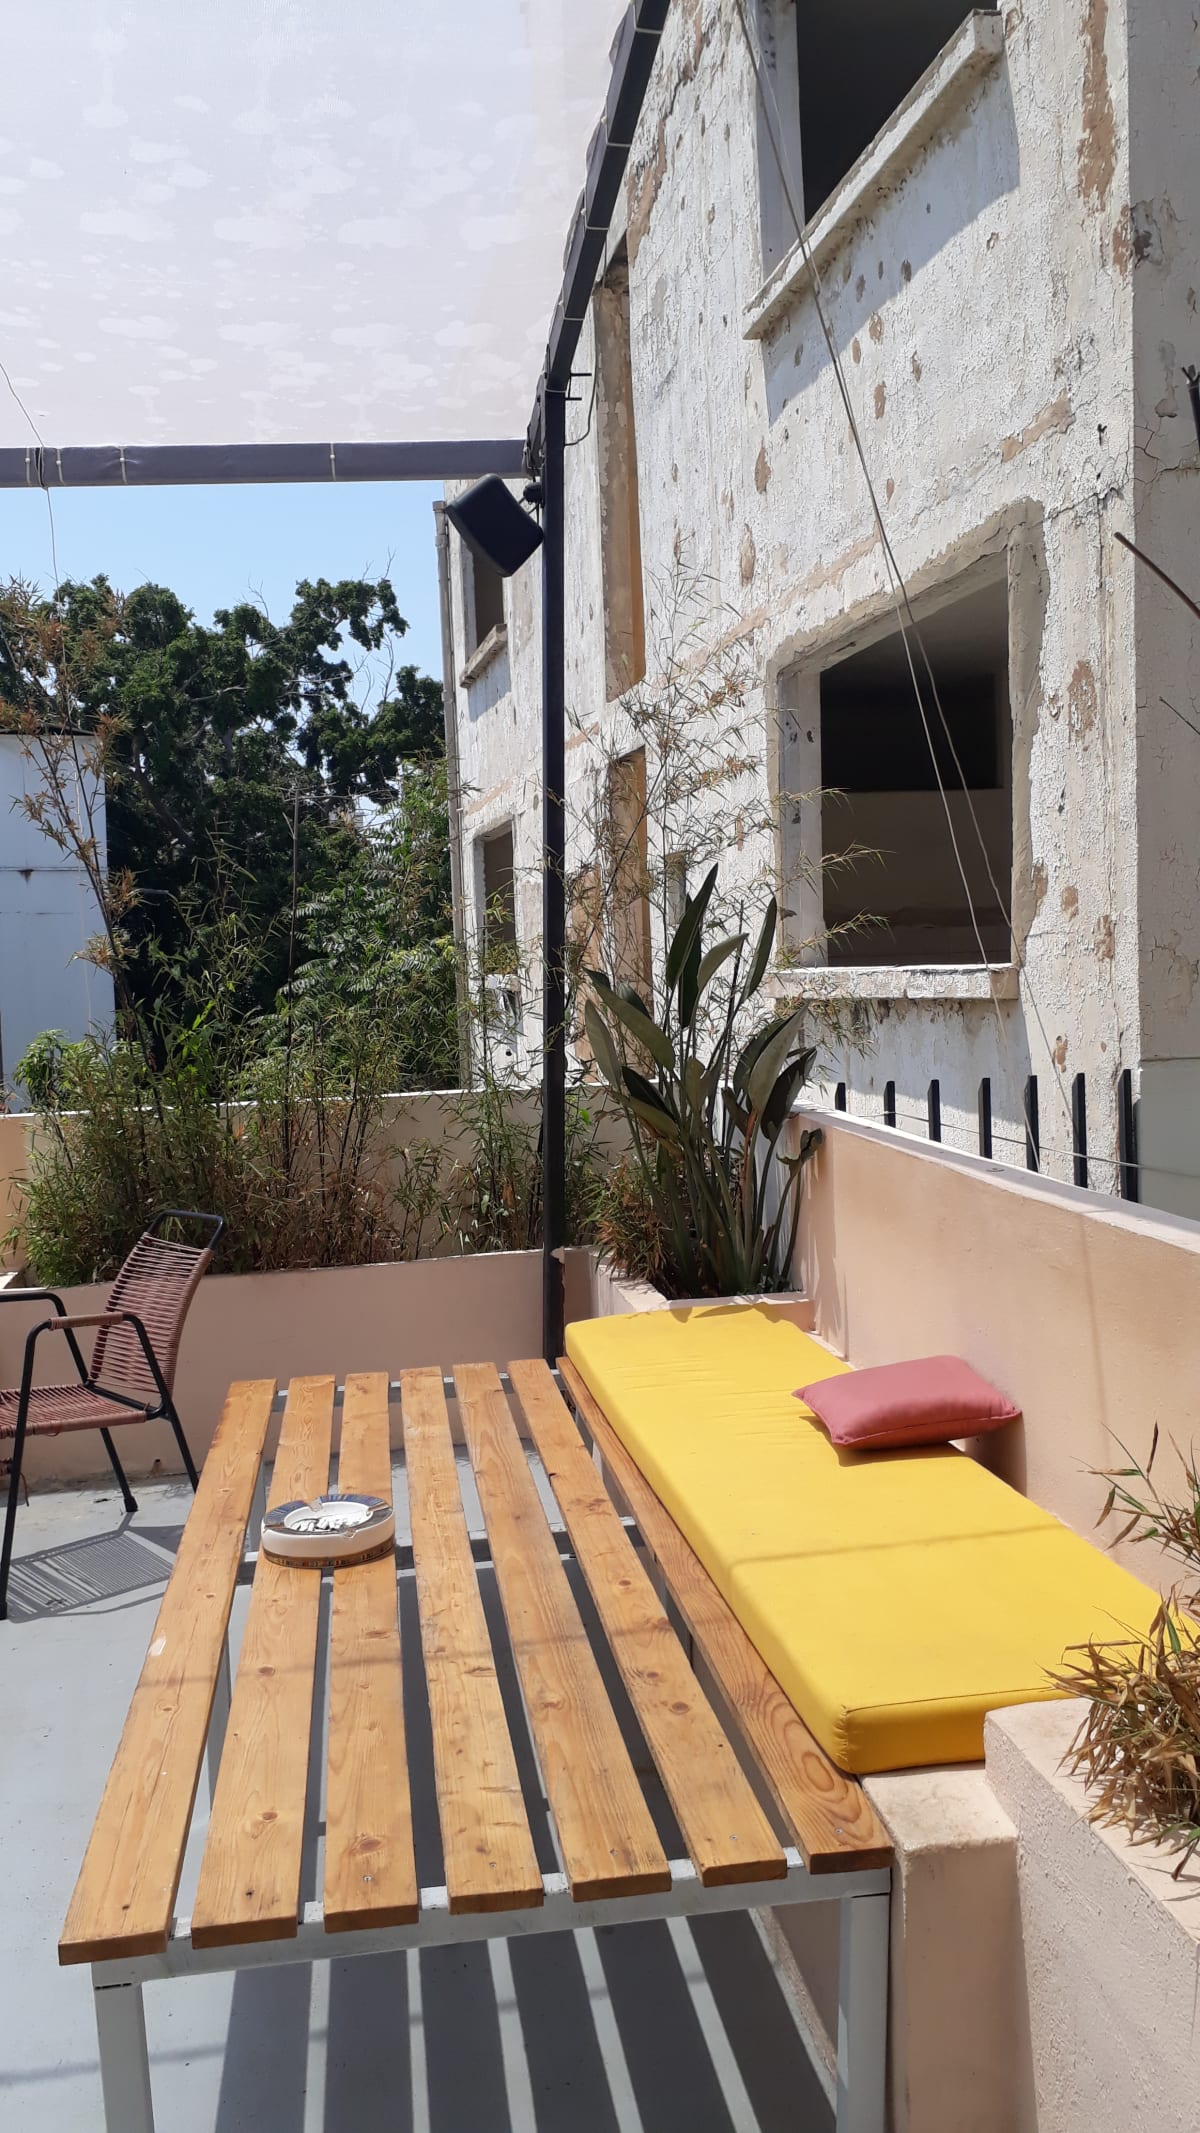 The Colony Beirut Hostel, Beirut, Lebanon